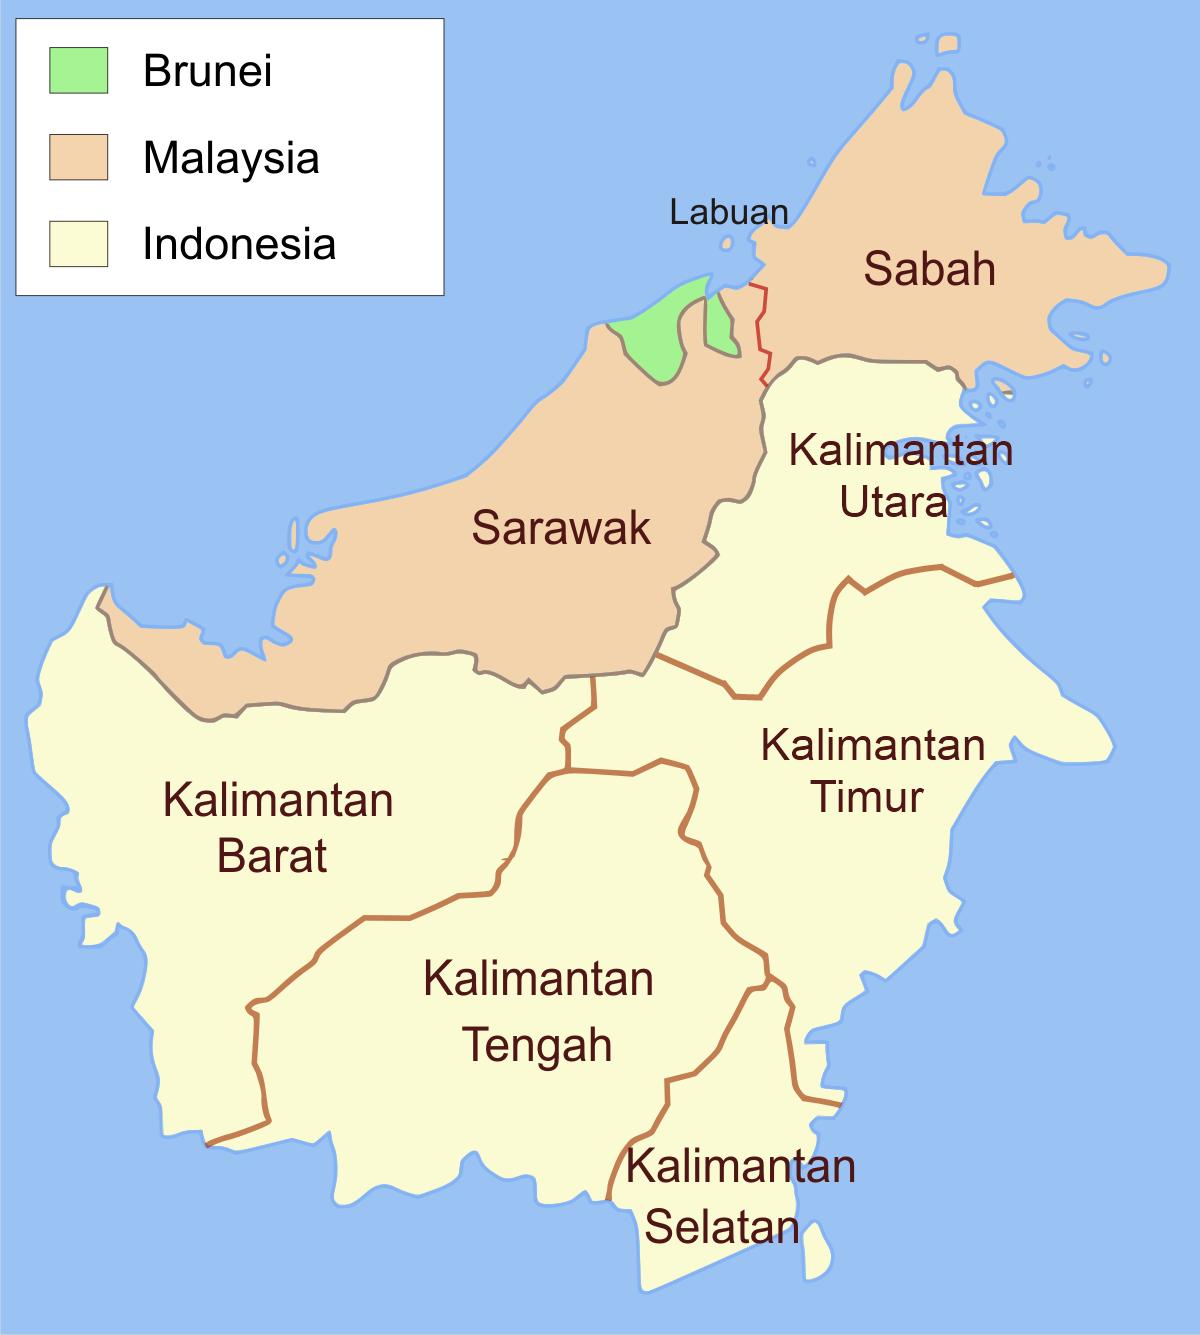 Strategies For Revitalizing Endangered Borneo Languages A Comparison Between Negara Brunei Darussalam And Sarawak Malaysia